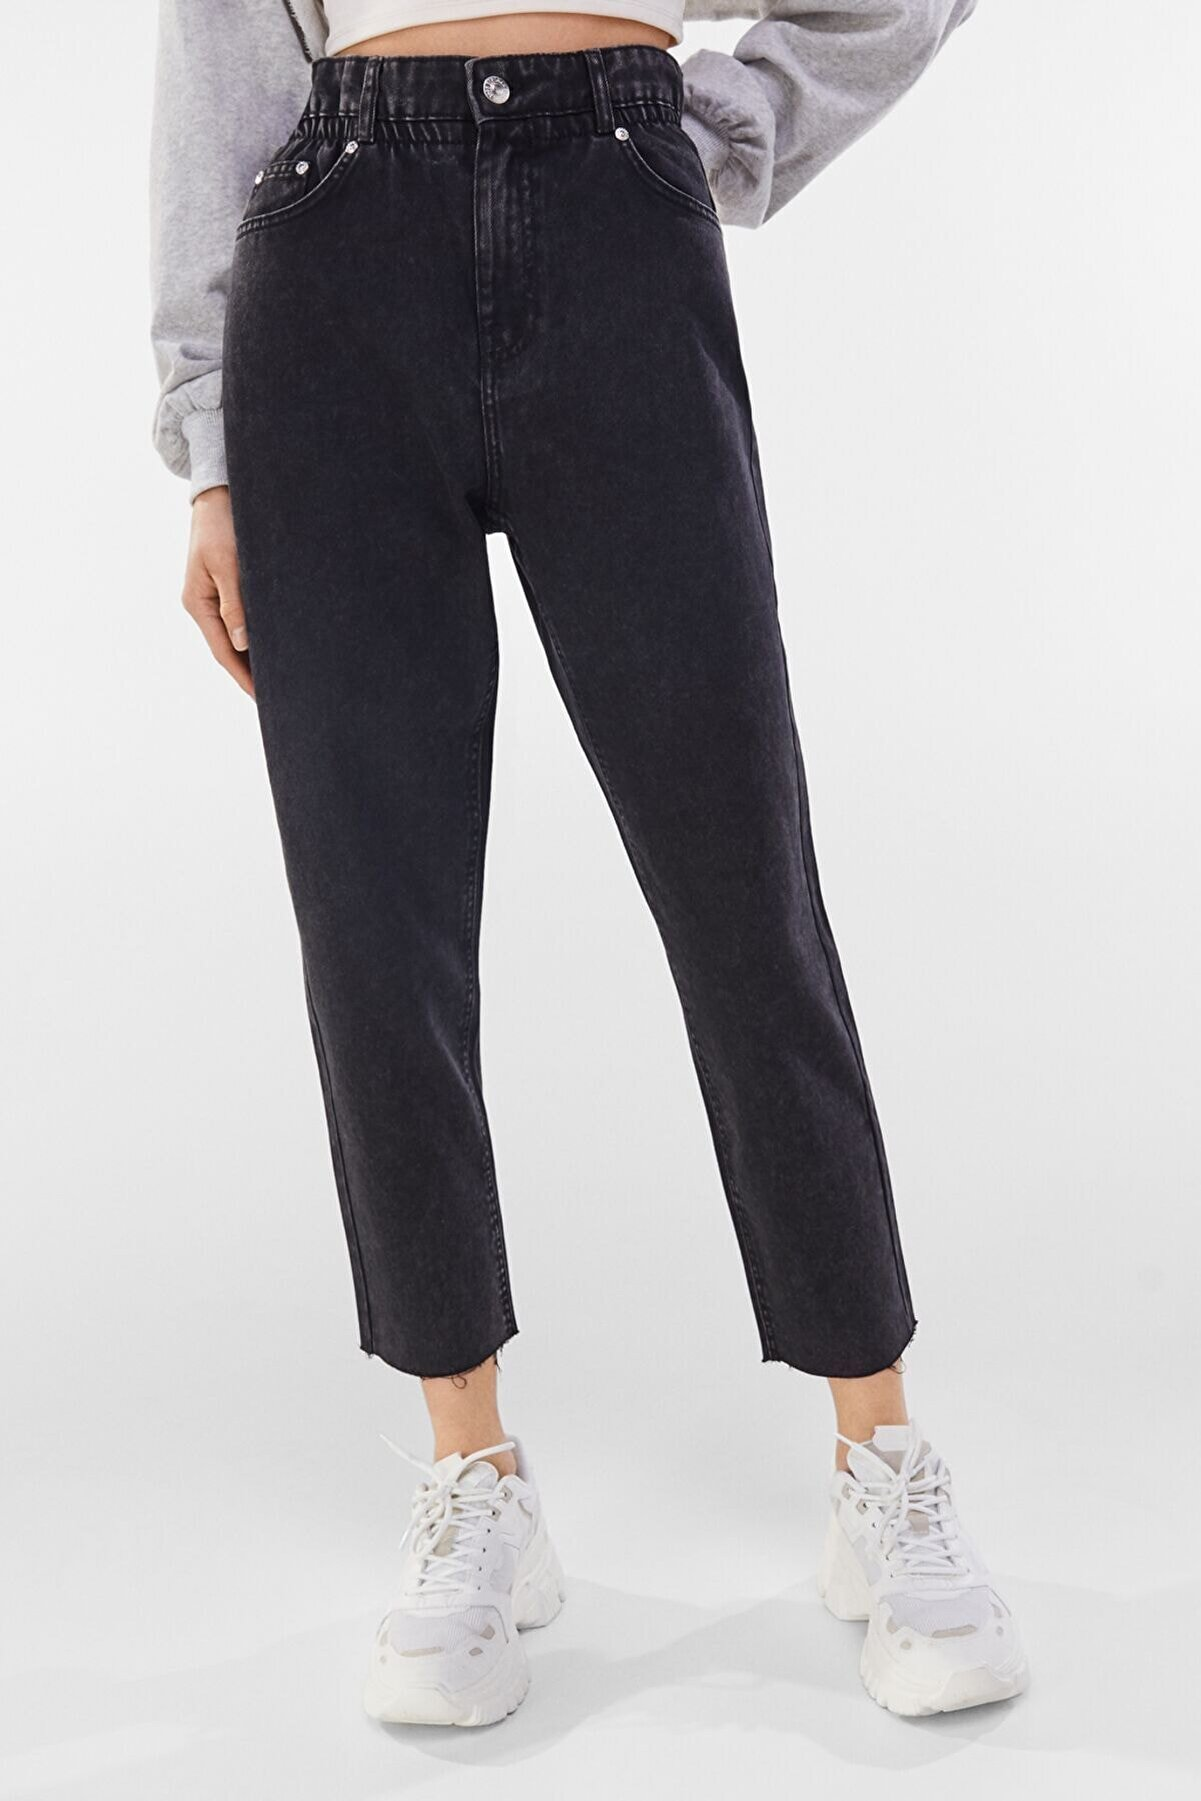 Bershka Kadın Siyah Fitilli Crop Straight Fit Pantolon